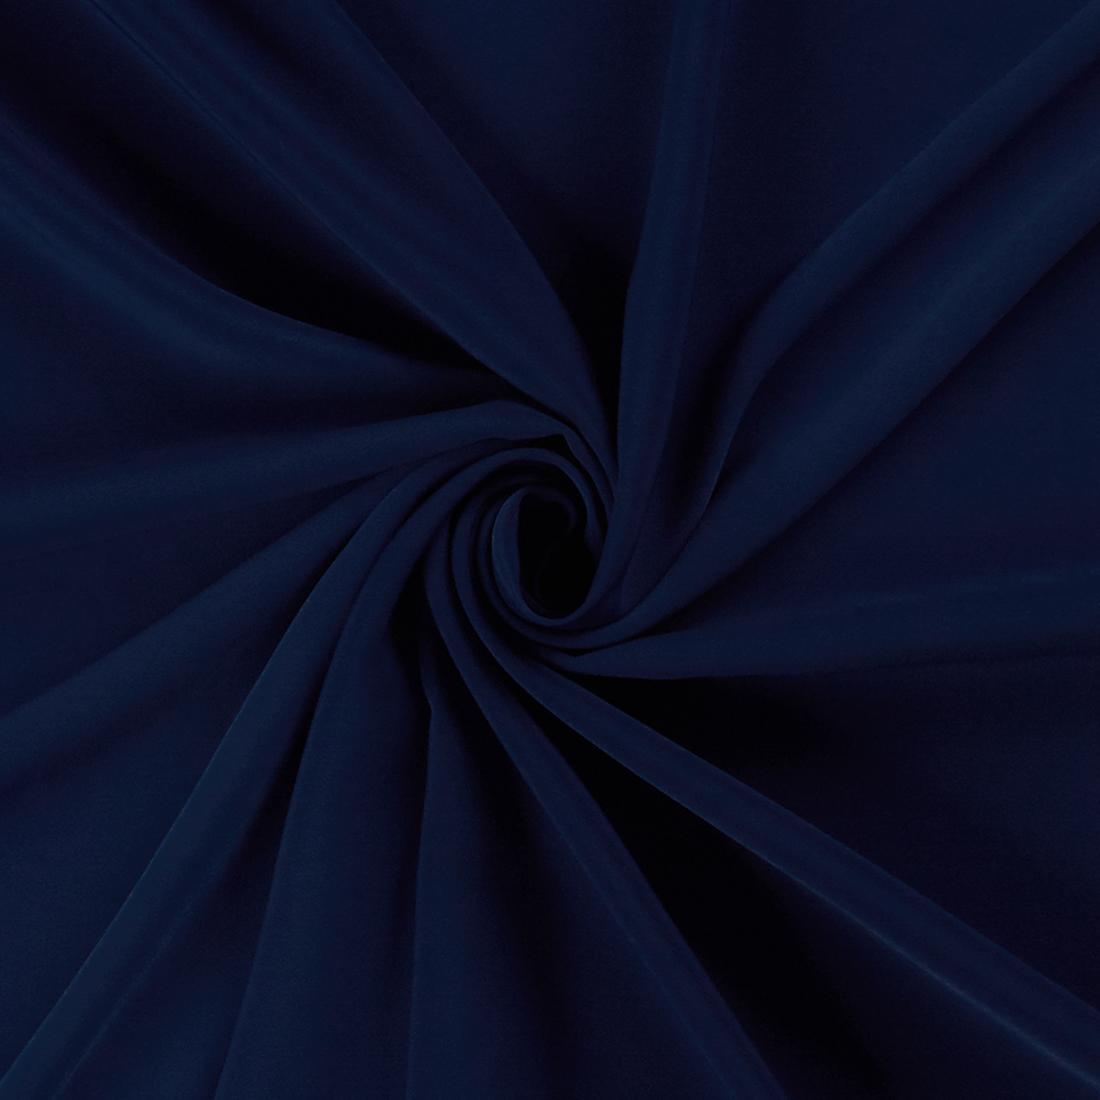 Luxury Crepe Navy Dress Fabric